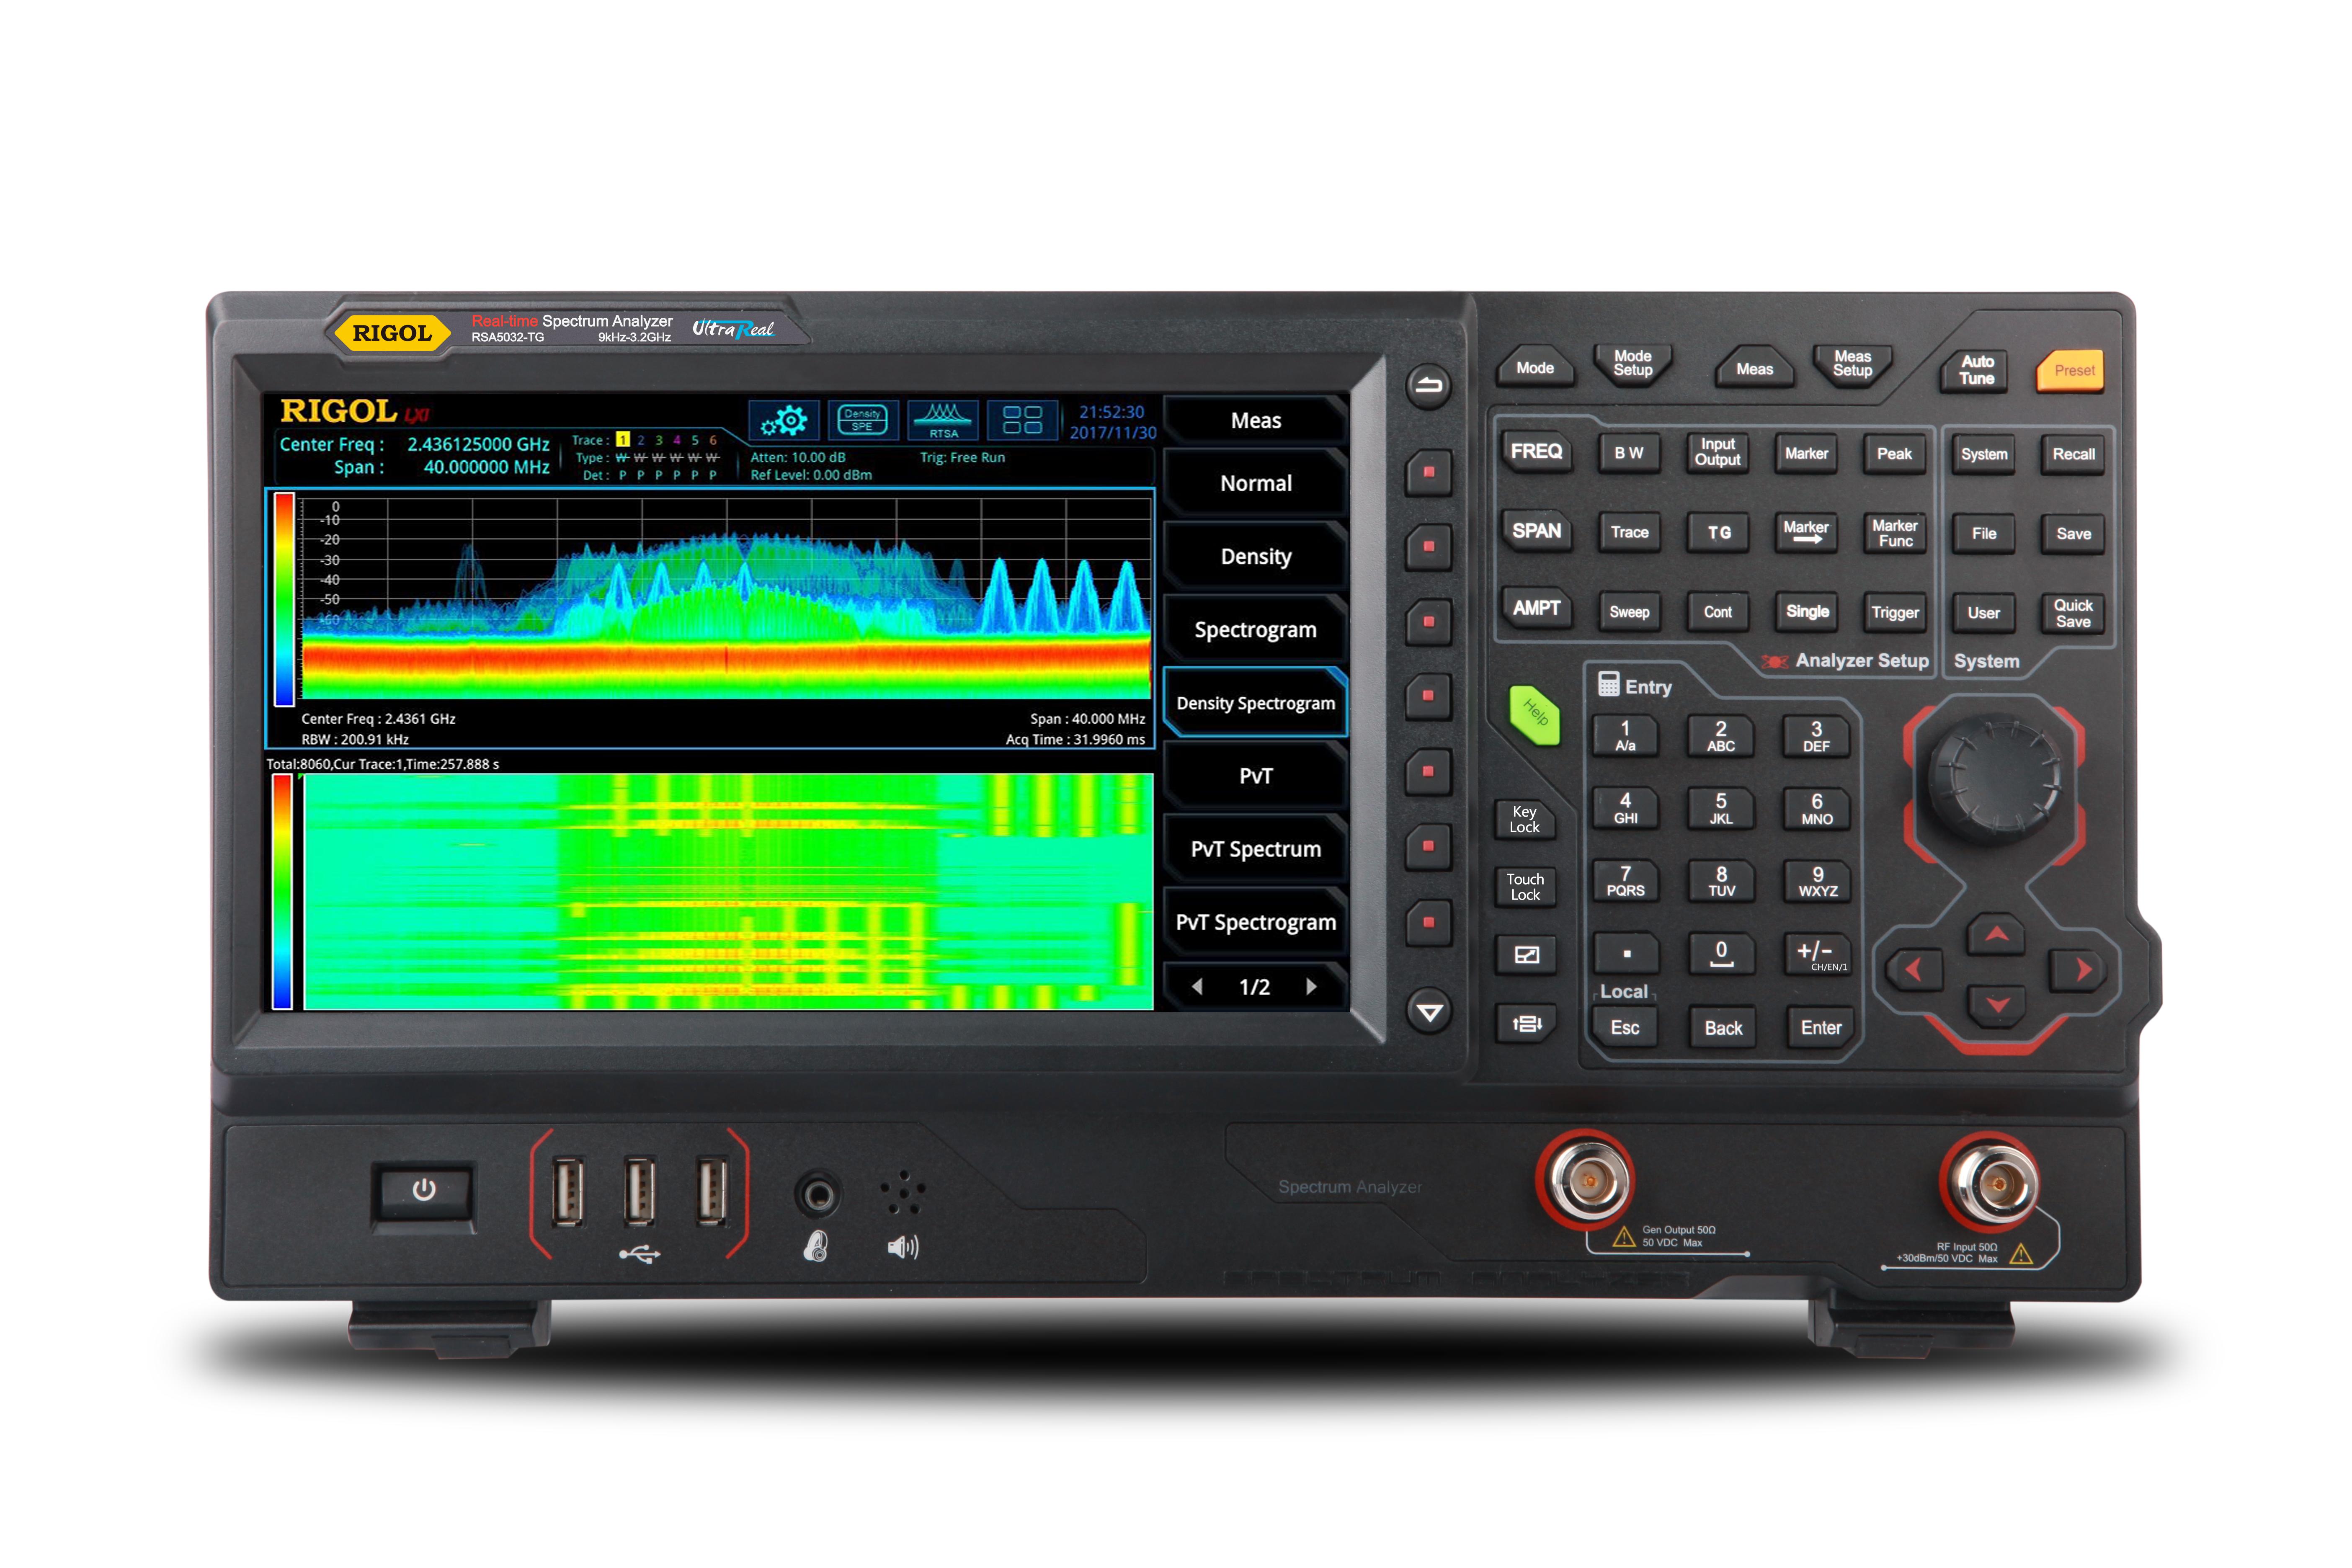 Rigol RSA5032-TG Reaaliaikainen spektrianalysaattori 3,2GHz (tracking  generator)